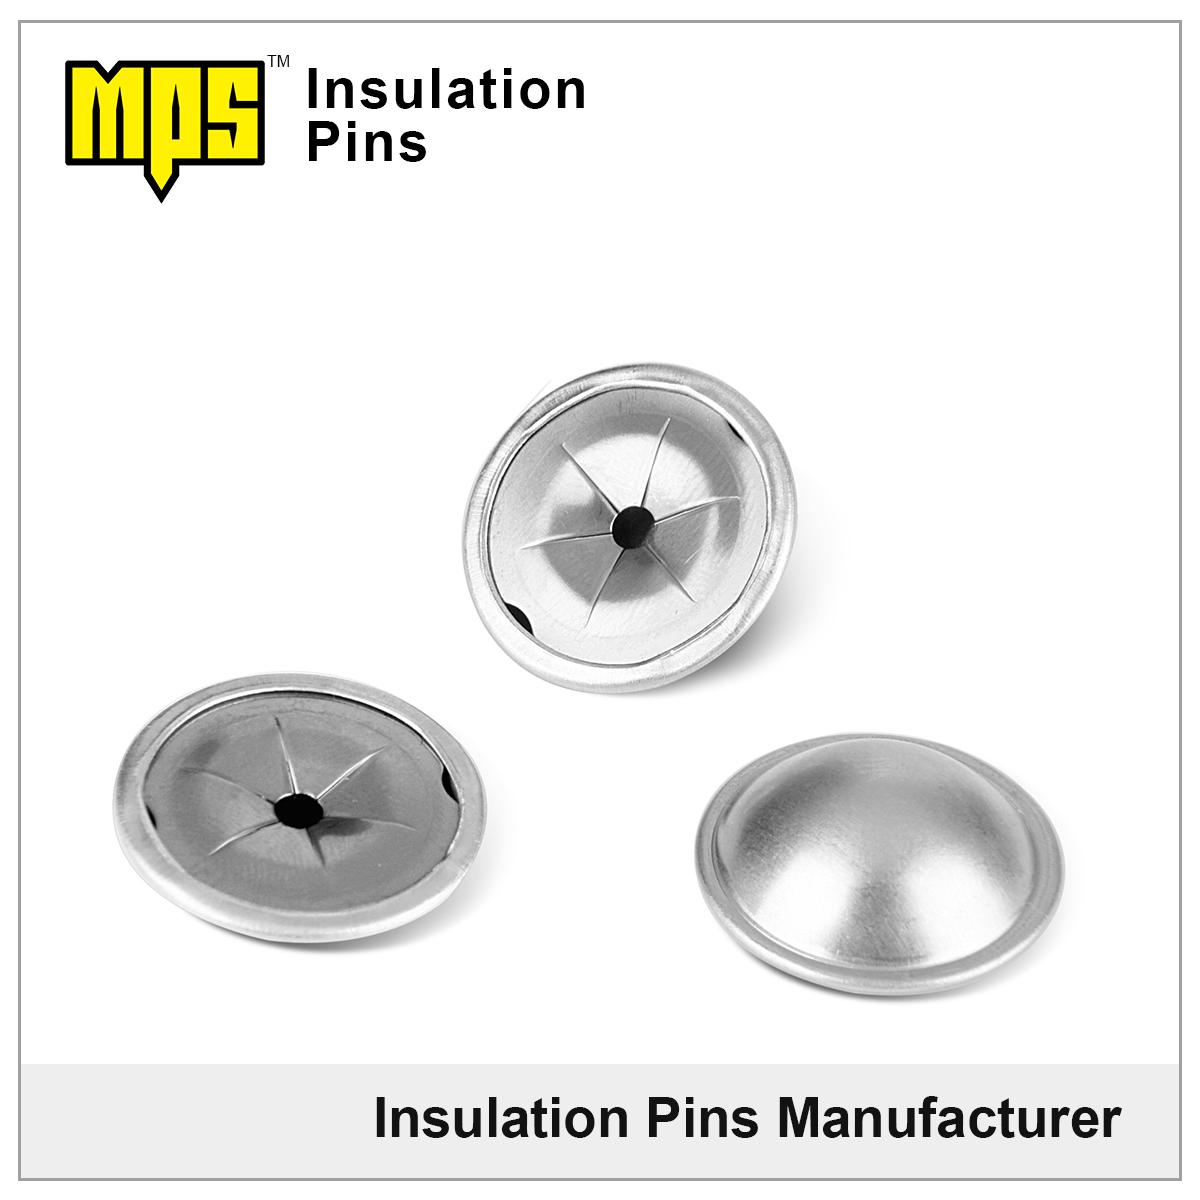 Aluminum housing, stainless steel insert Dome caps